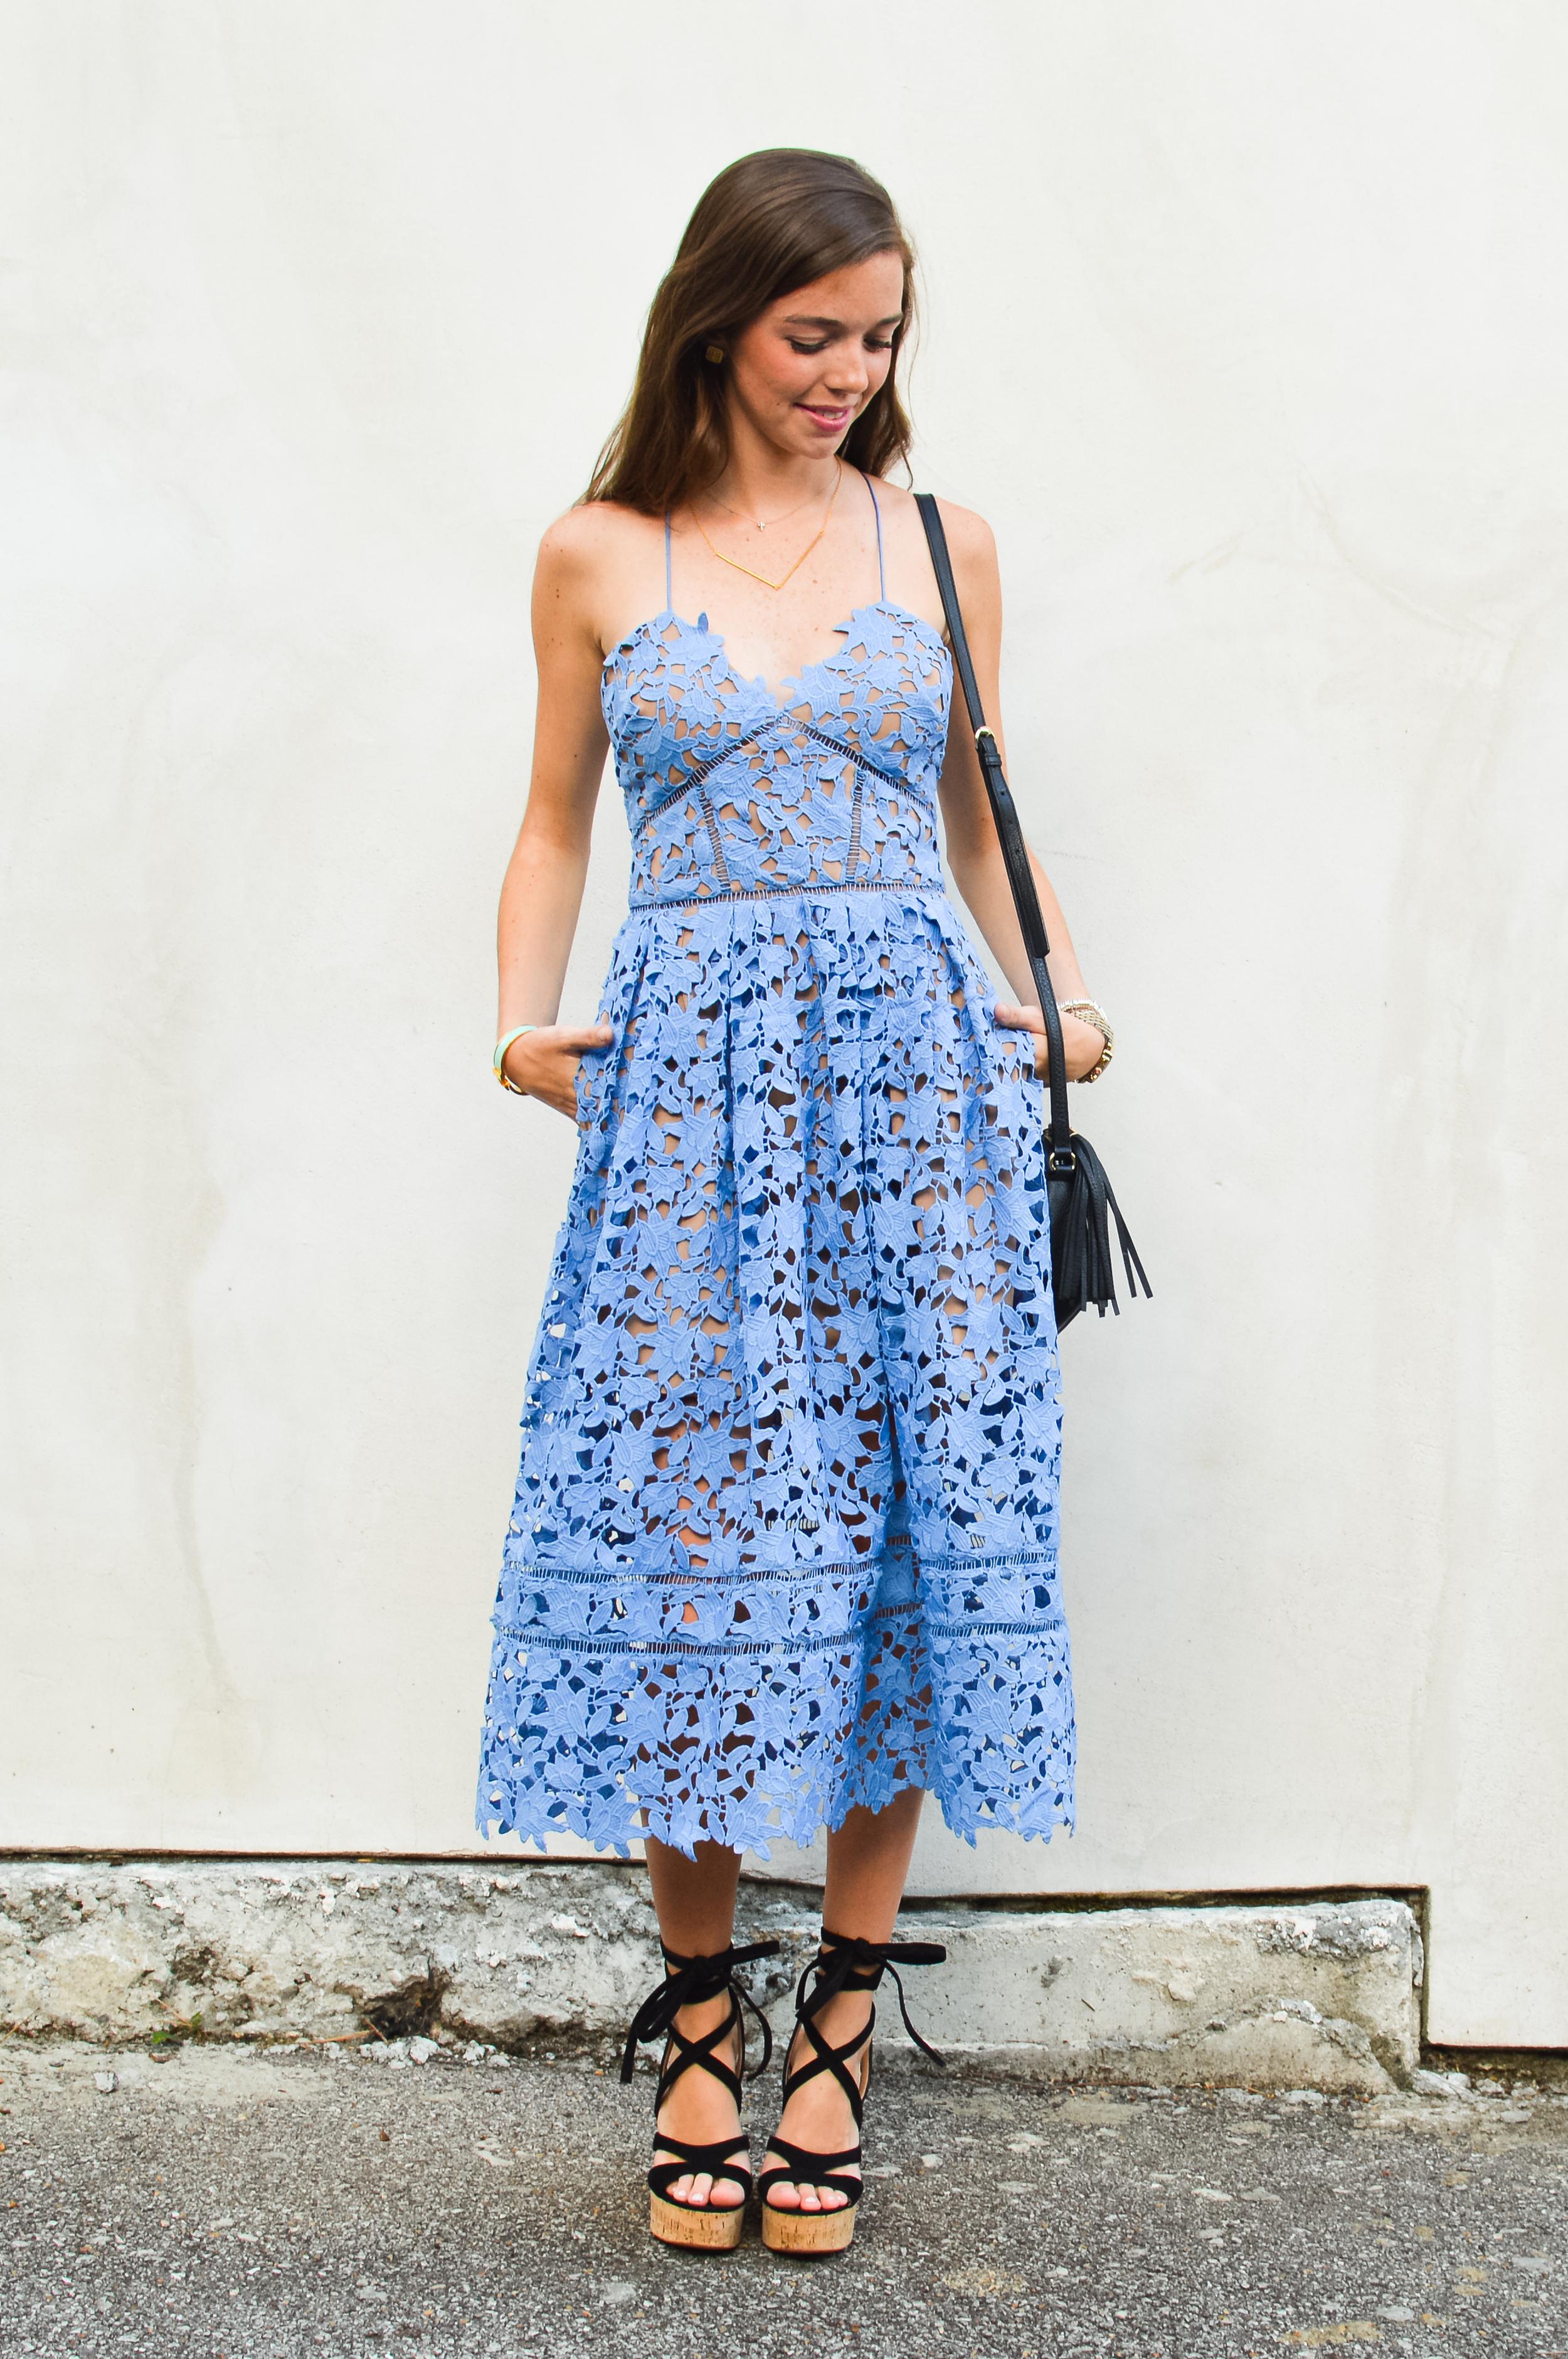 lcb_style_fashion_blogger_selfportrait_dress (10 of 48).jpg